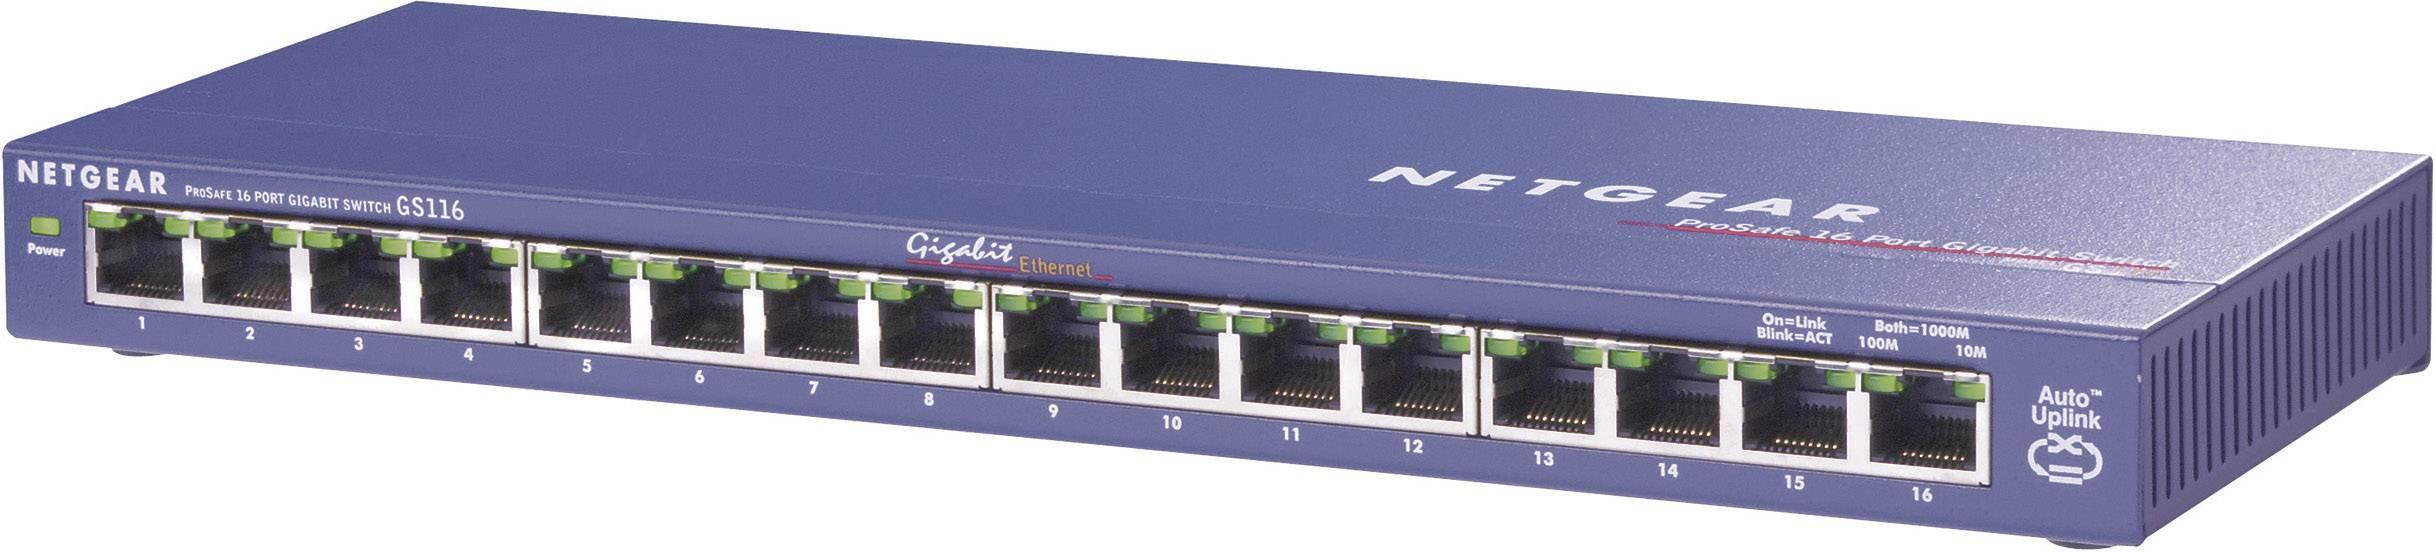 Sieťový switch RJ45 NETGEAR GS116GE, 16 portov, 1 Gbit/s